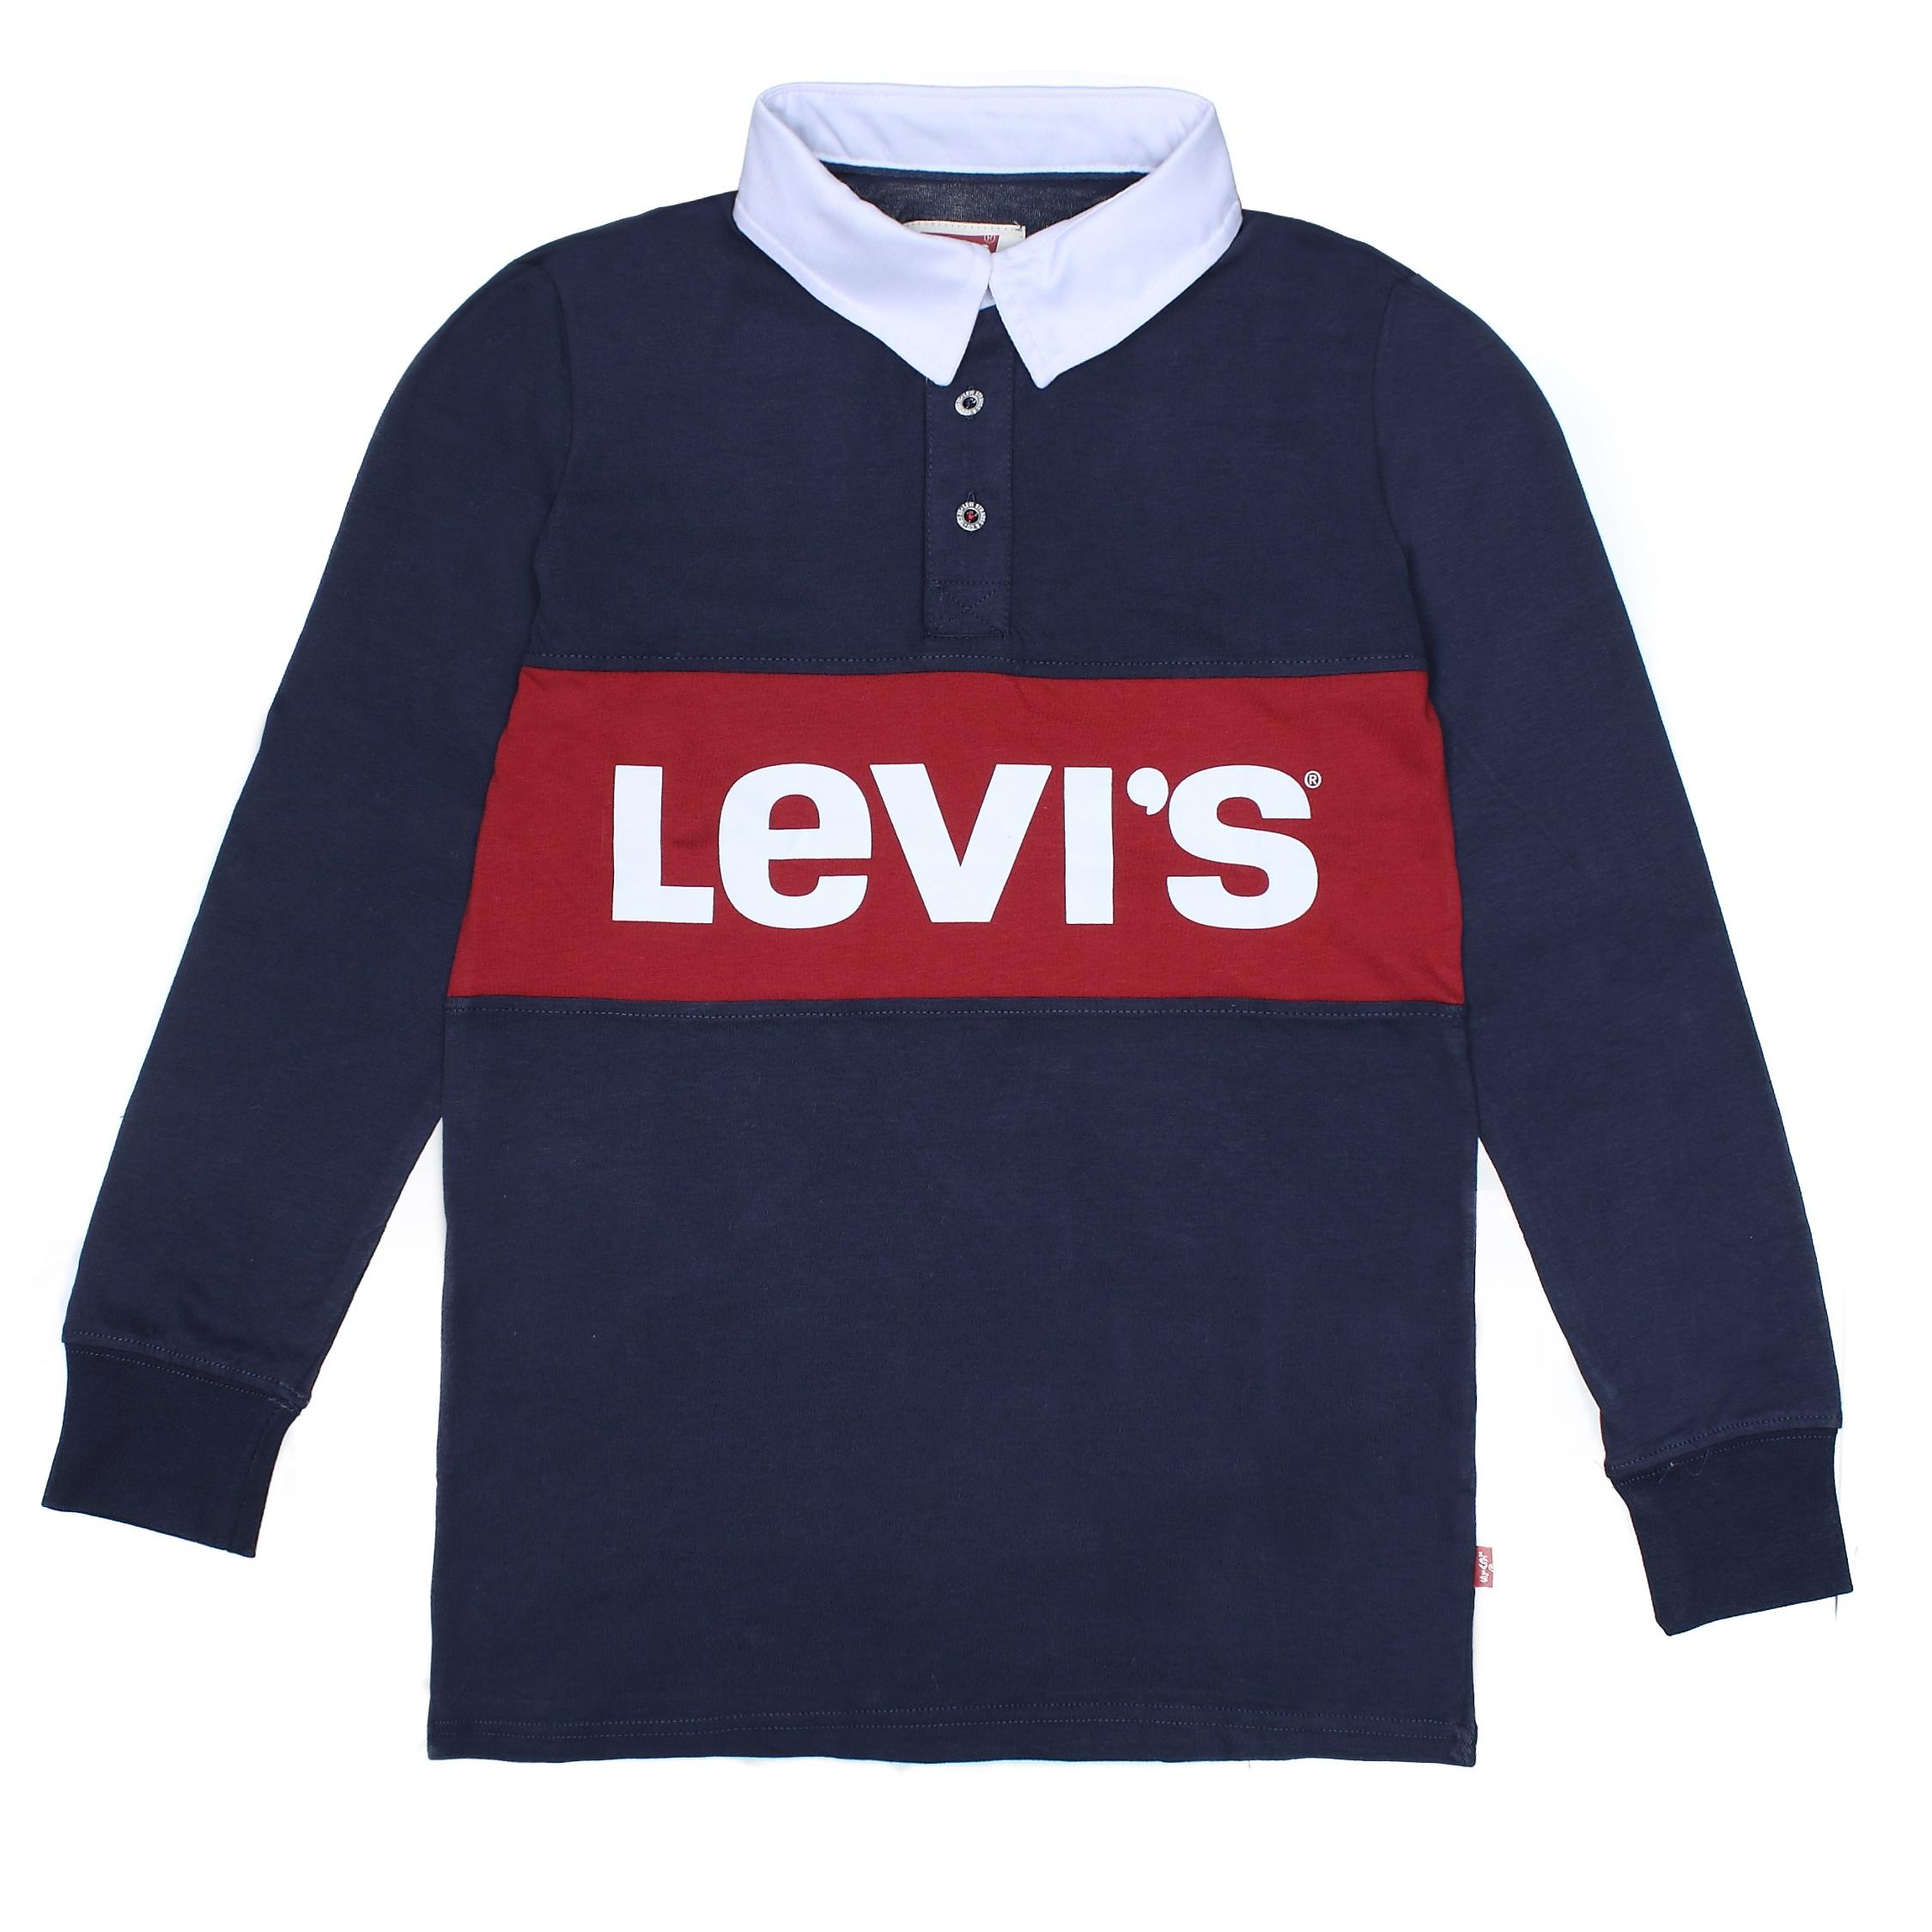 https://www.leadermode.com/184381/levi-s-kids-a163-u09-dress-blue.jpg